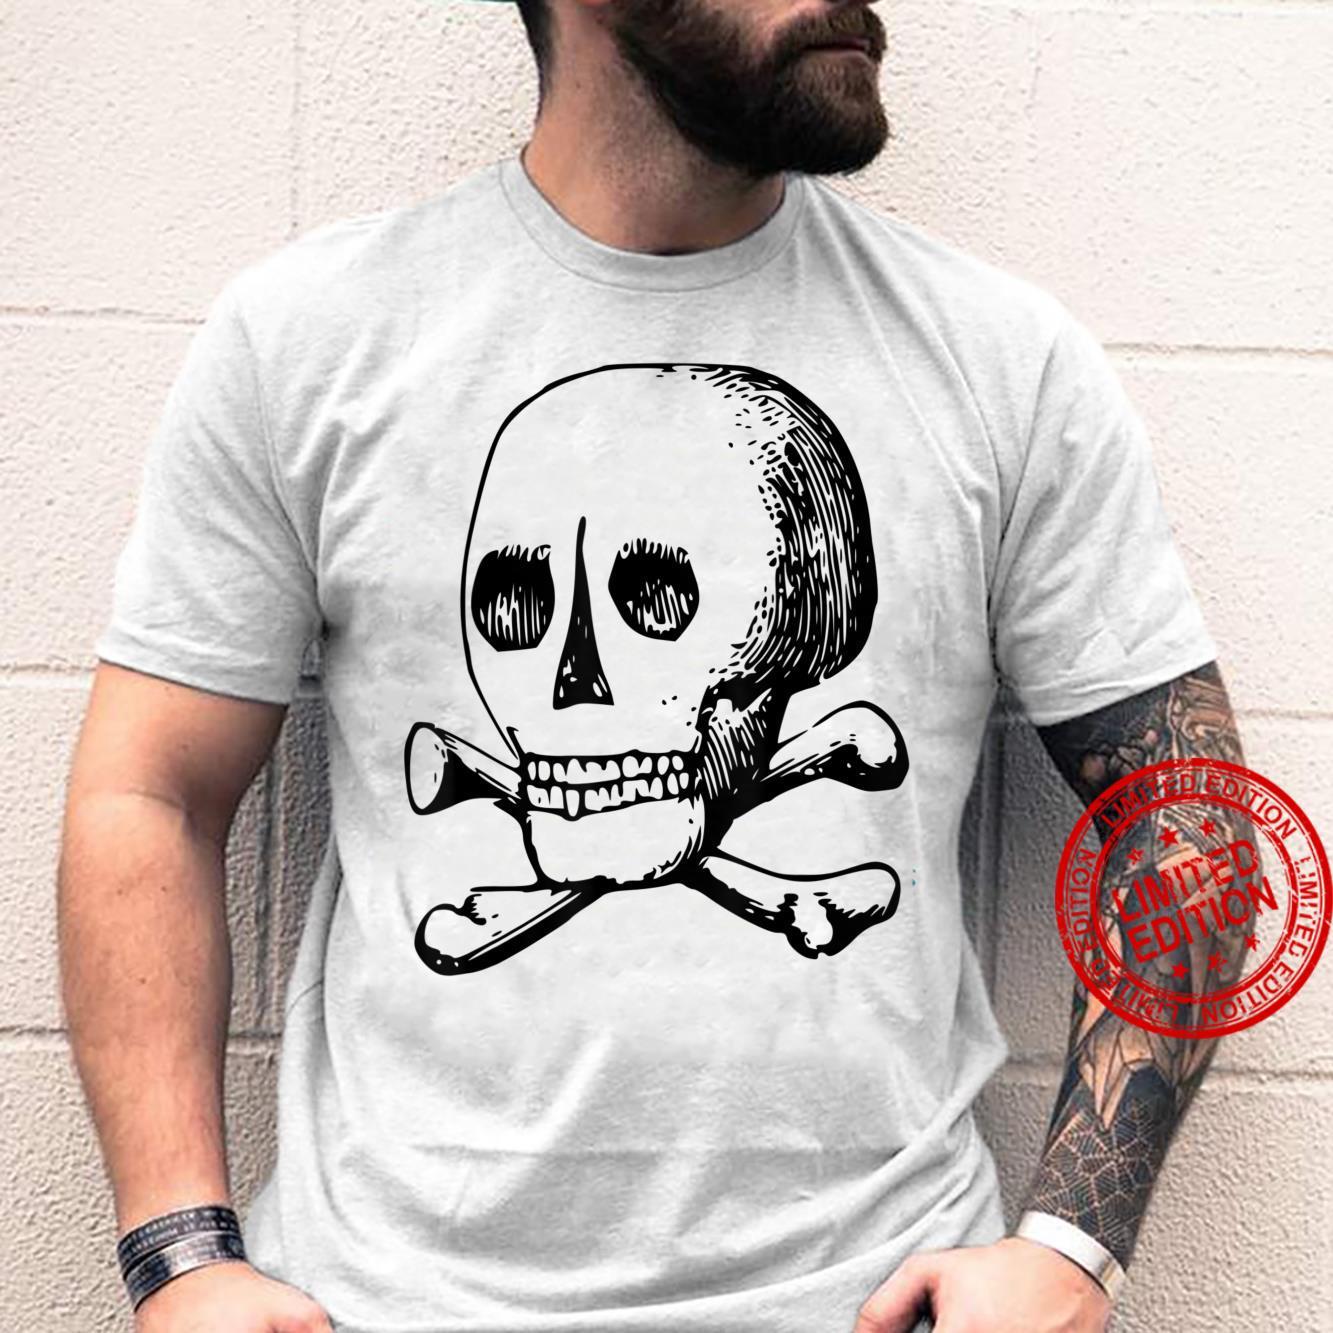 Dark Art Sketch Goth Occult Skull Gothic Aesthetic Shirt